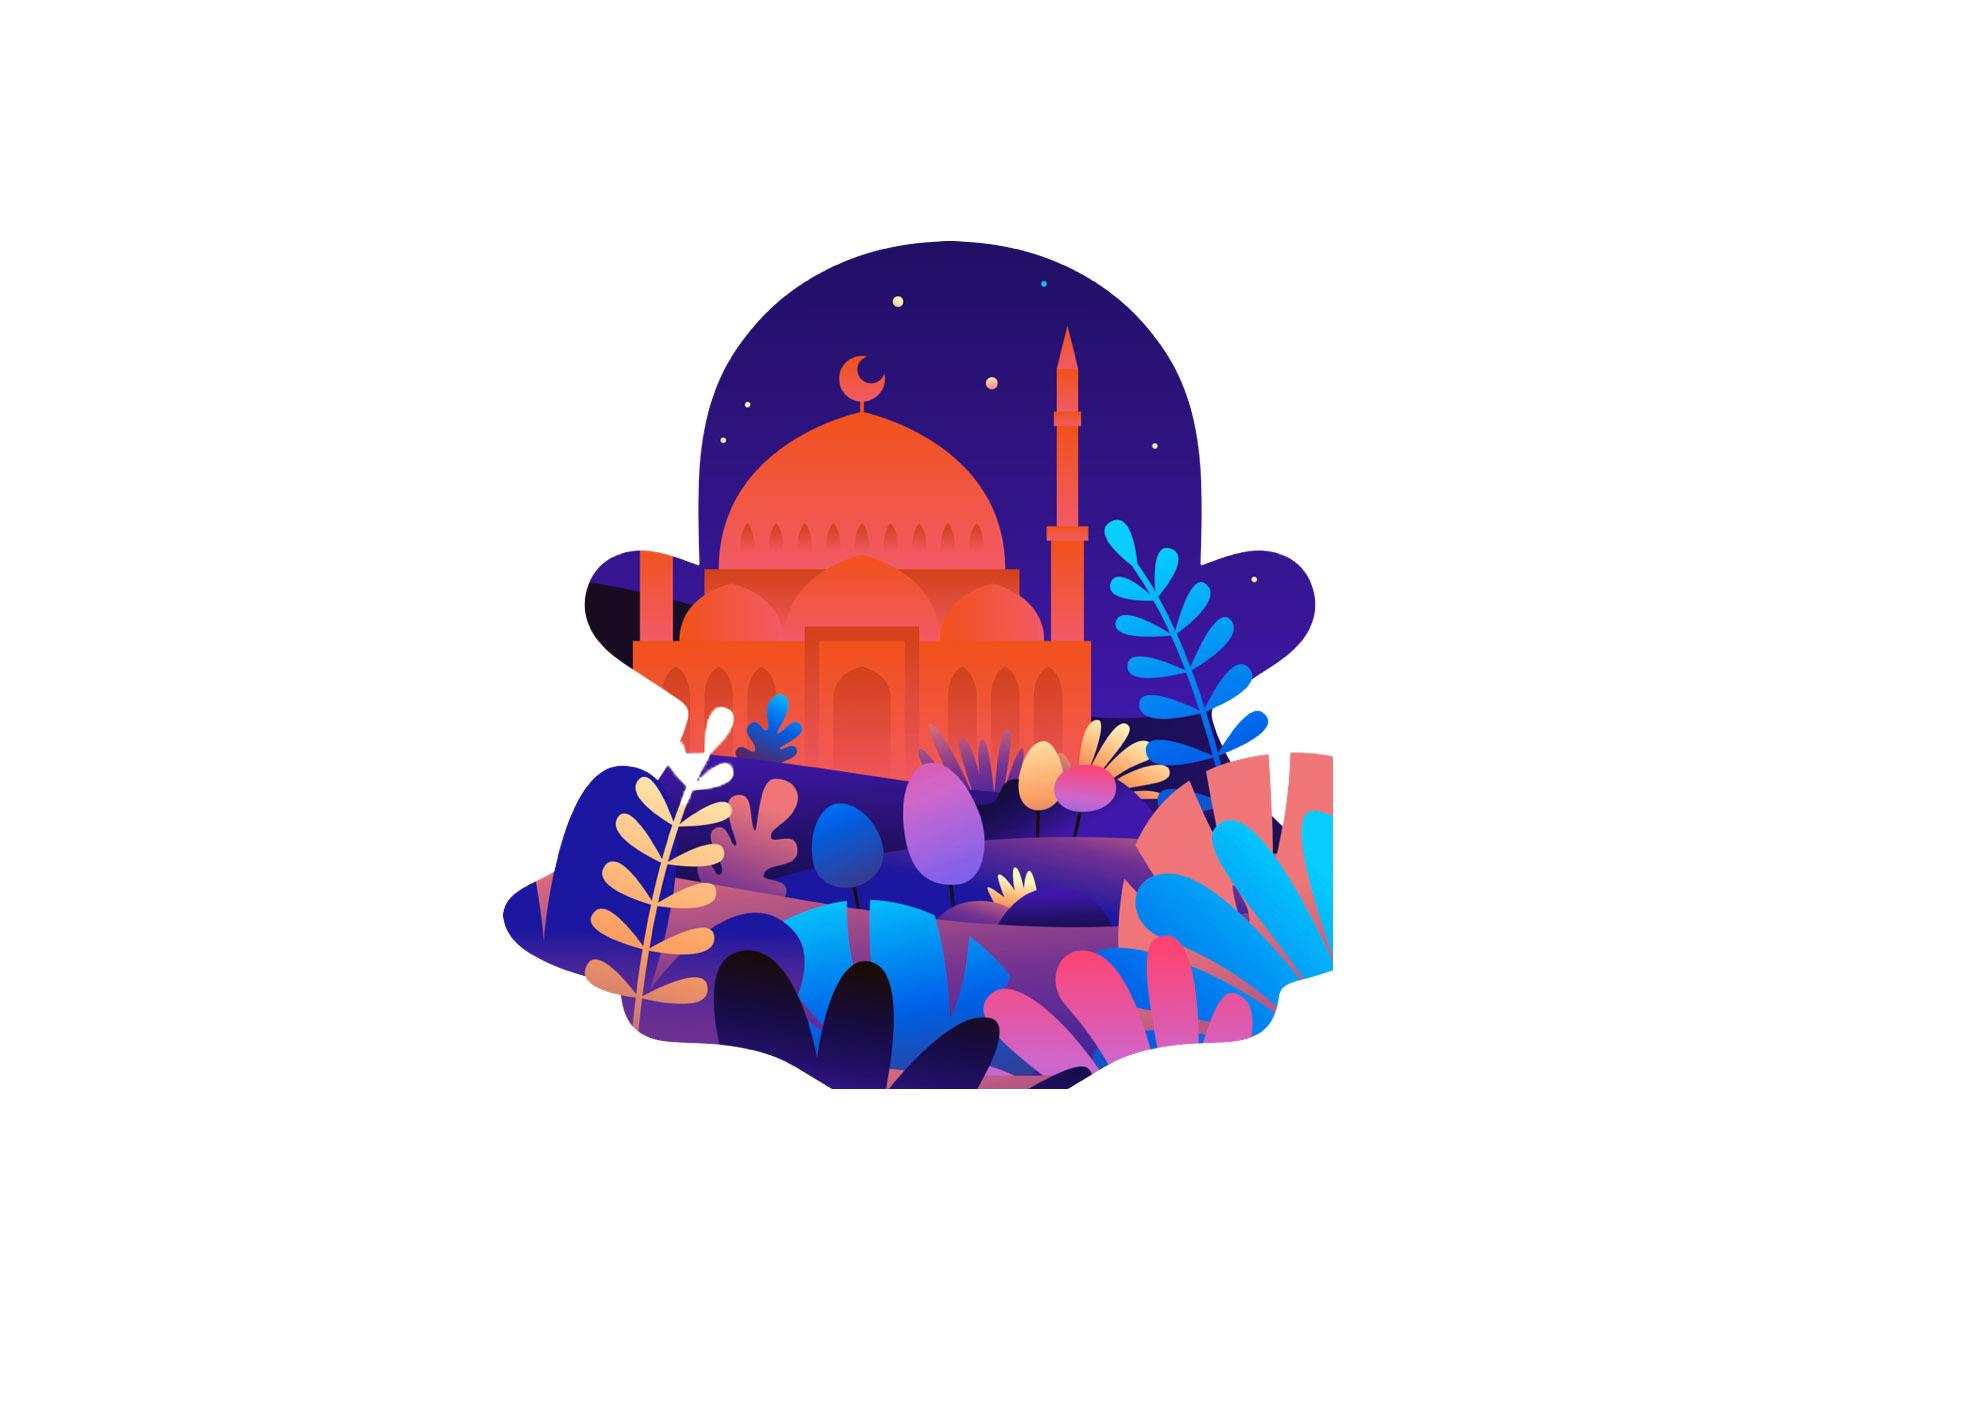 snapchat-shares-hacks-for-ramadan-2020